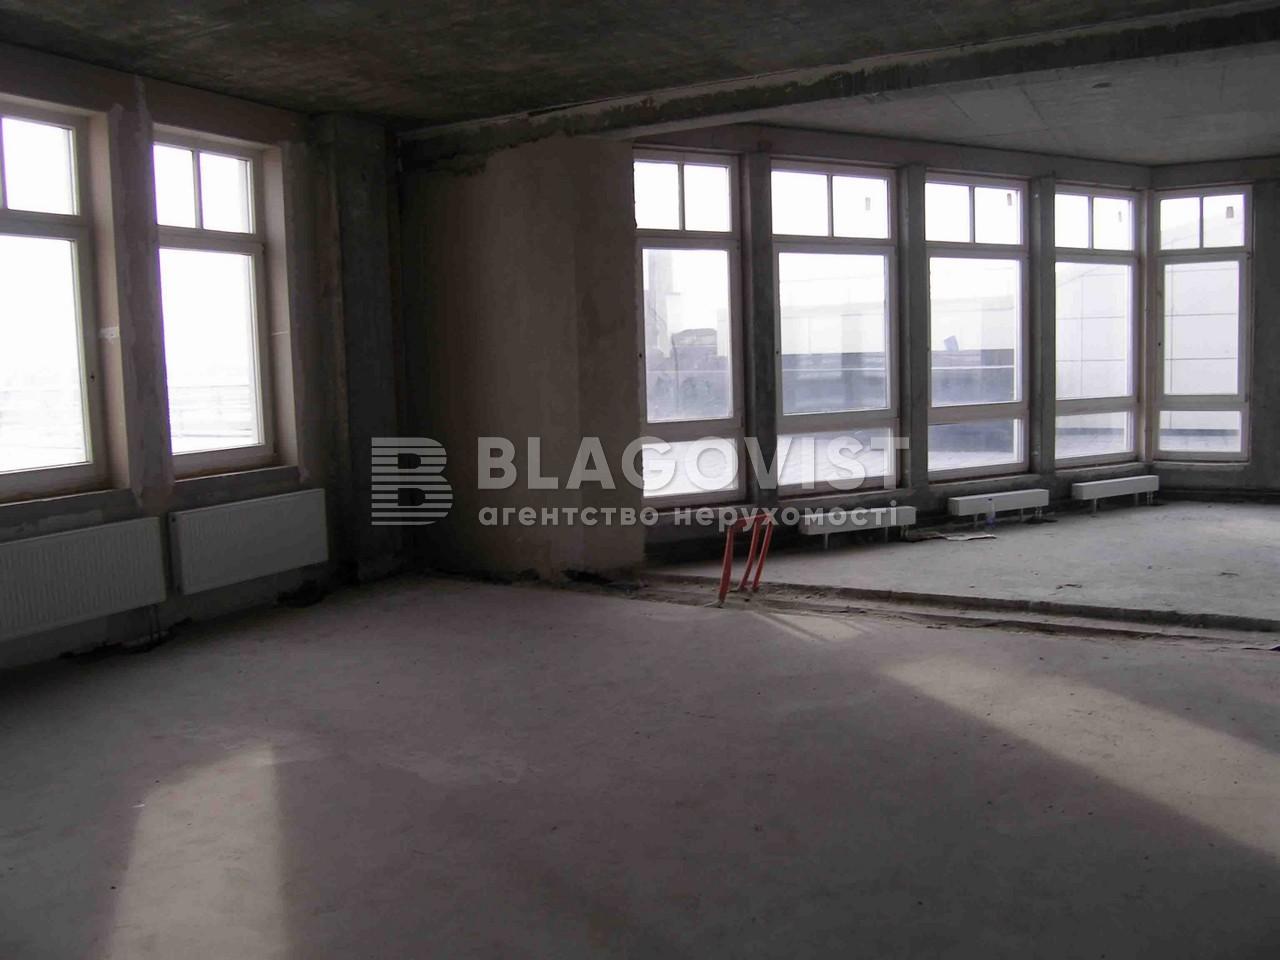 Квартира H-12557, Грушевского Михаила, 9а, Киев - Фото 7